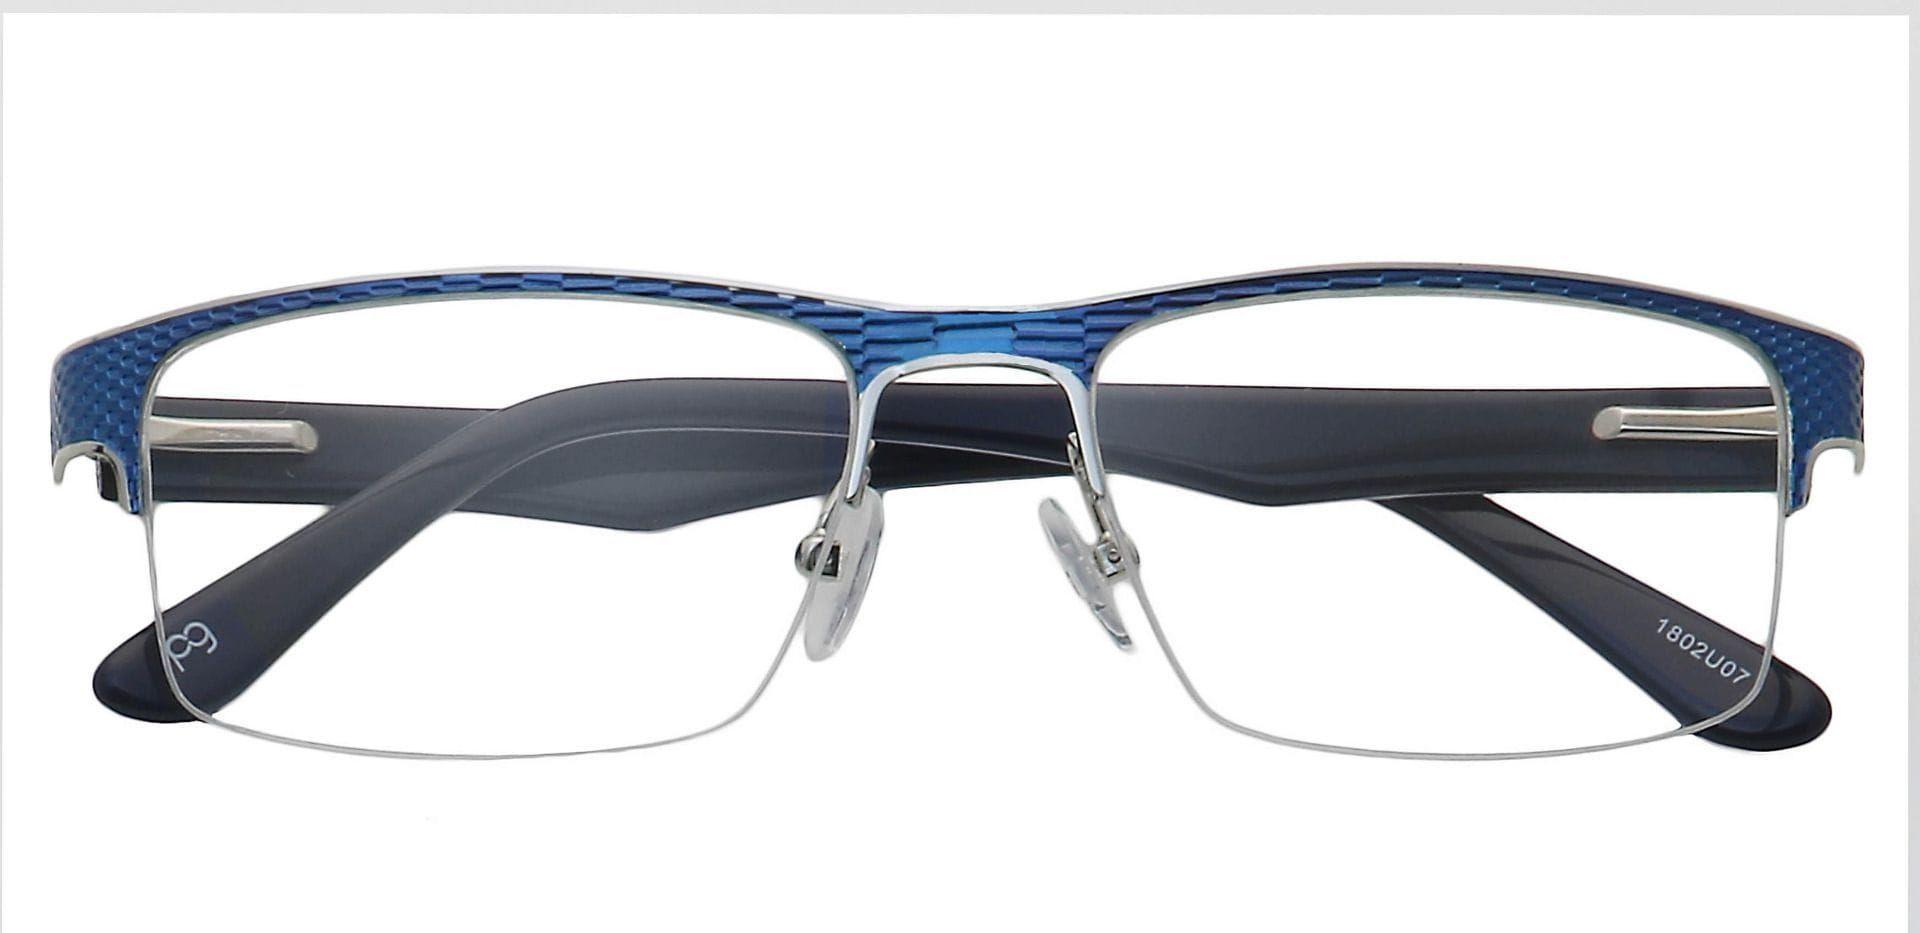 Rochelle Square Progressive Glasses - Blue